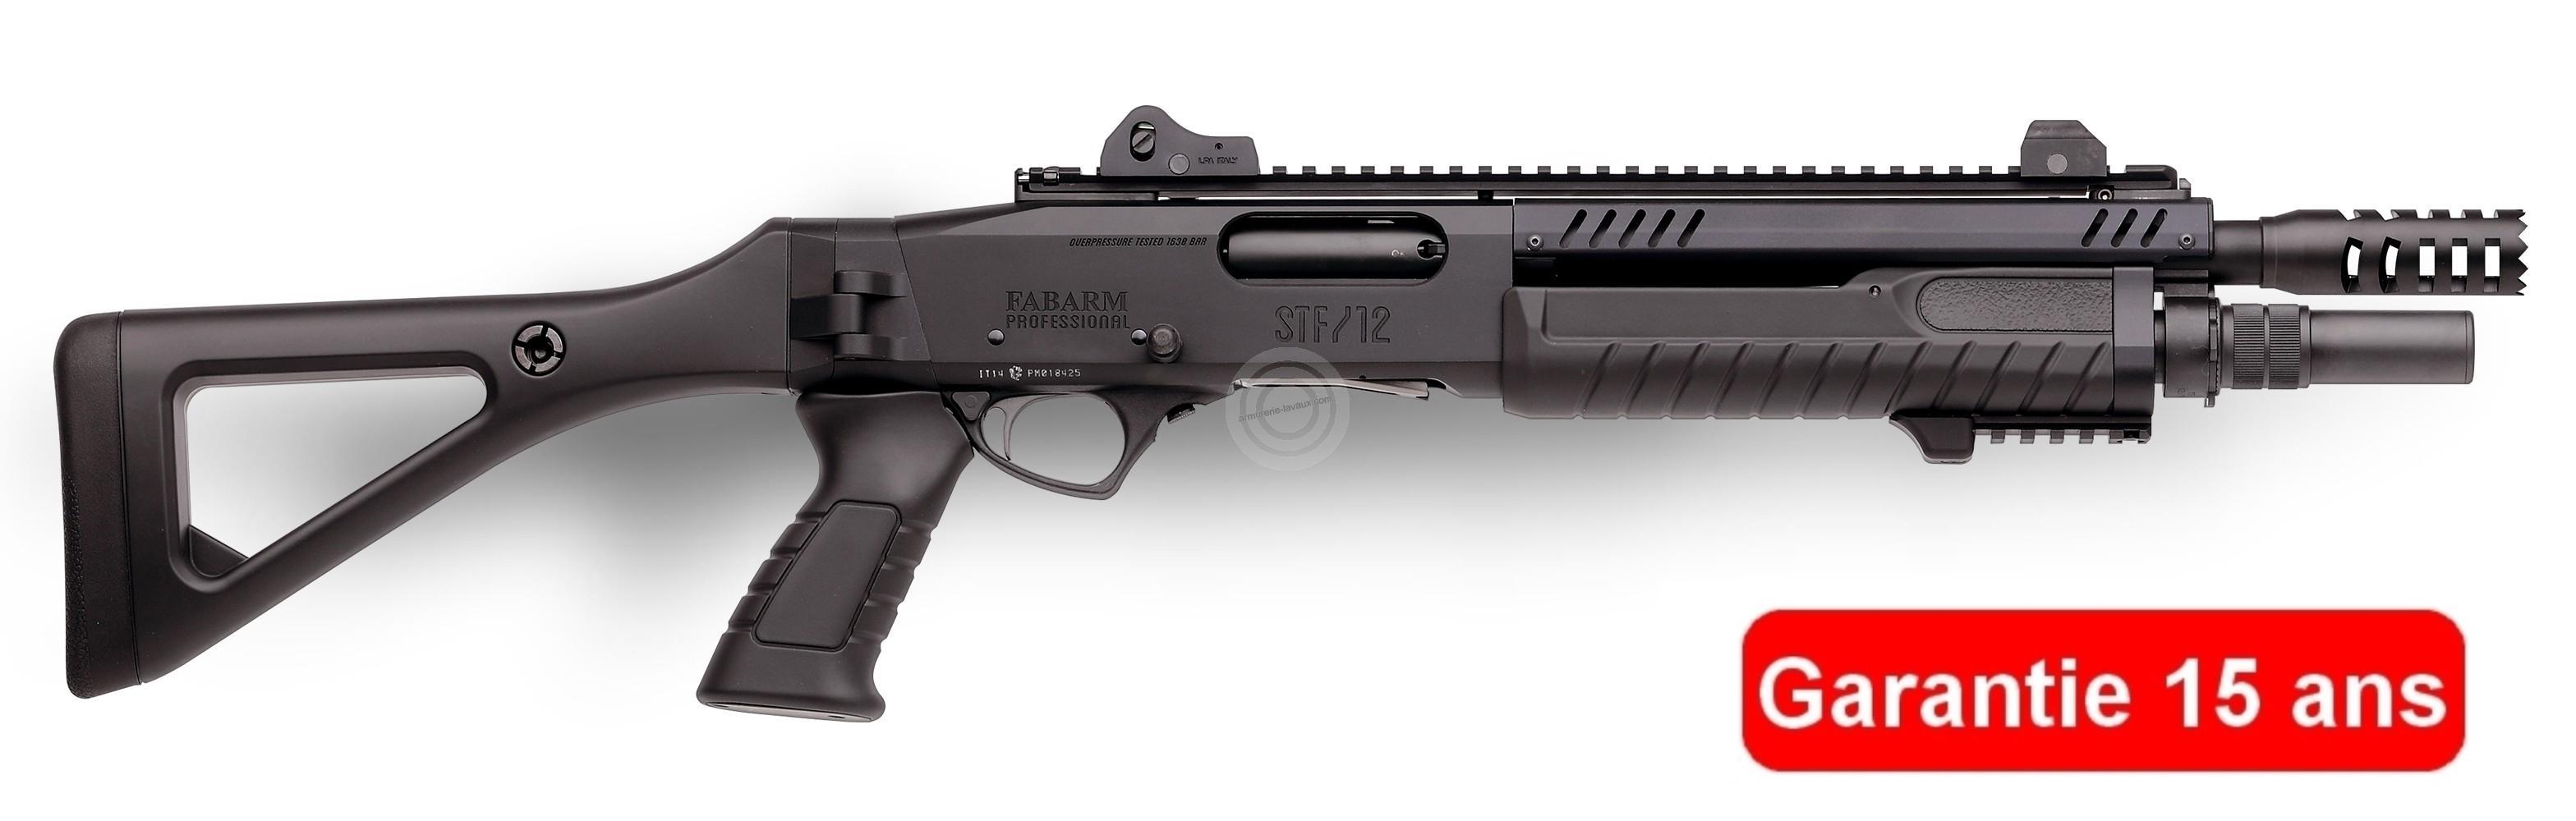 fusil pompe fabarm stf12 compact professionnal 11 armes cat gorie b sur armurerie. Black Bedroom Furniture Sets. Home Design Ideas